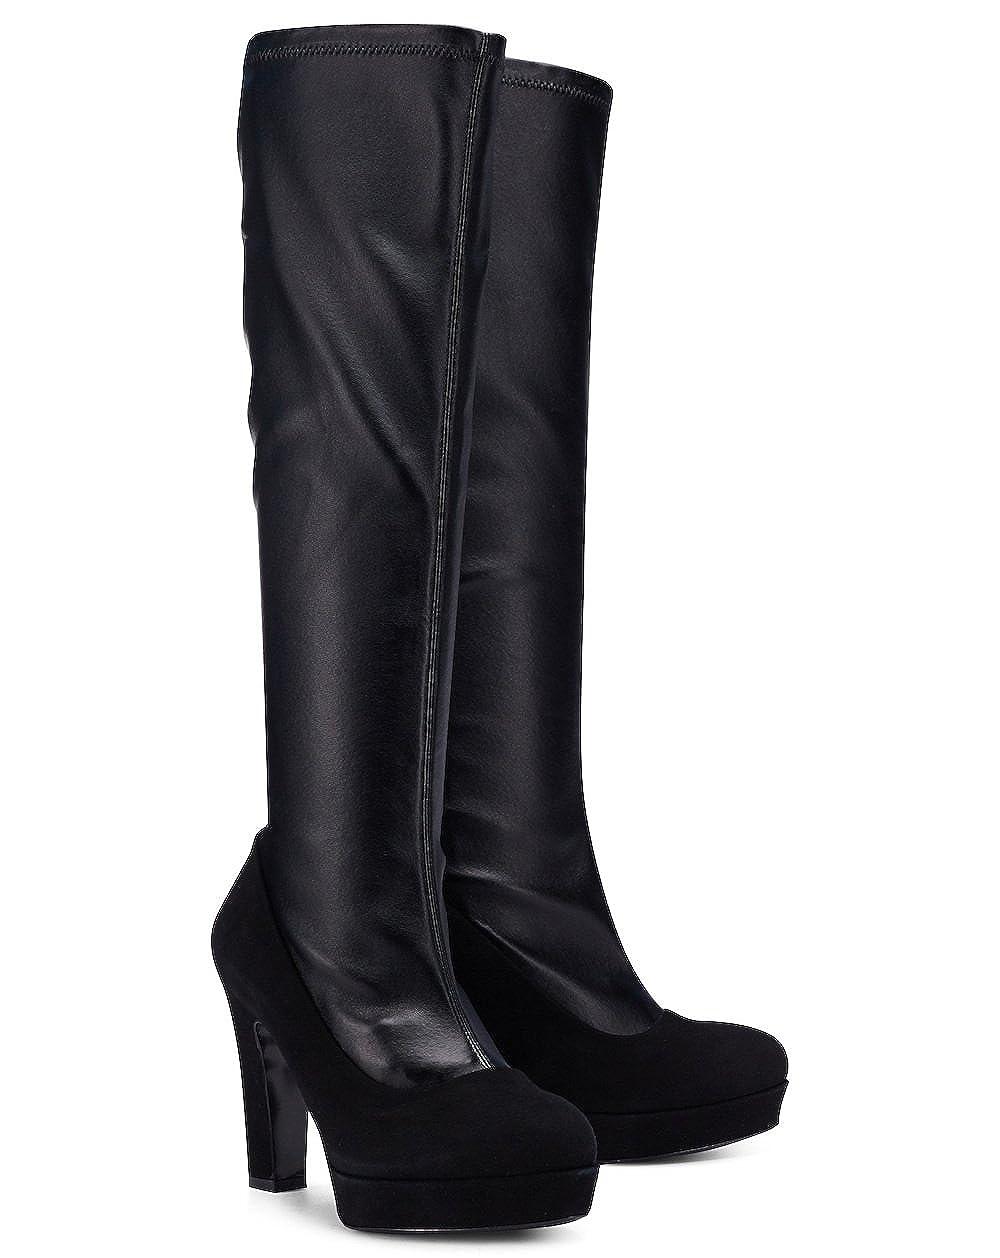 Intramontabile Stiefel Footwear Grace - Elegante Stiefel Intramontabile aus Veloursleder und Nappaleder 1ee525